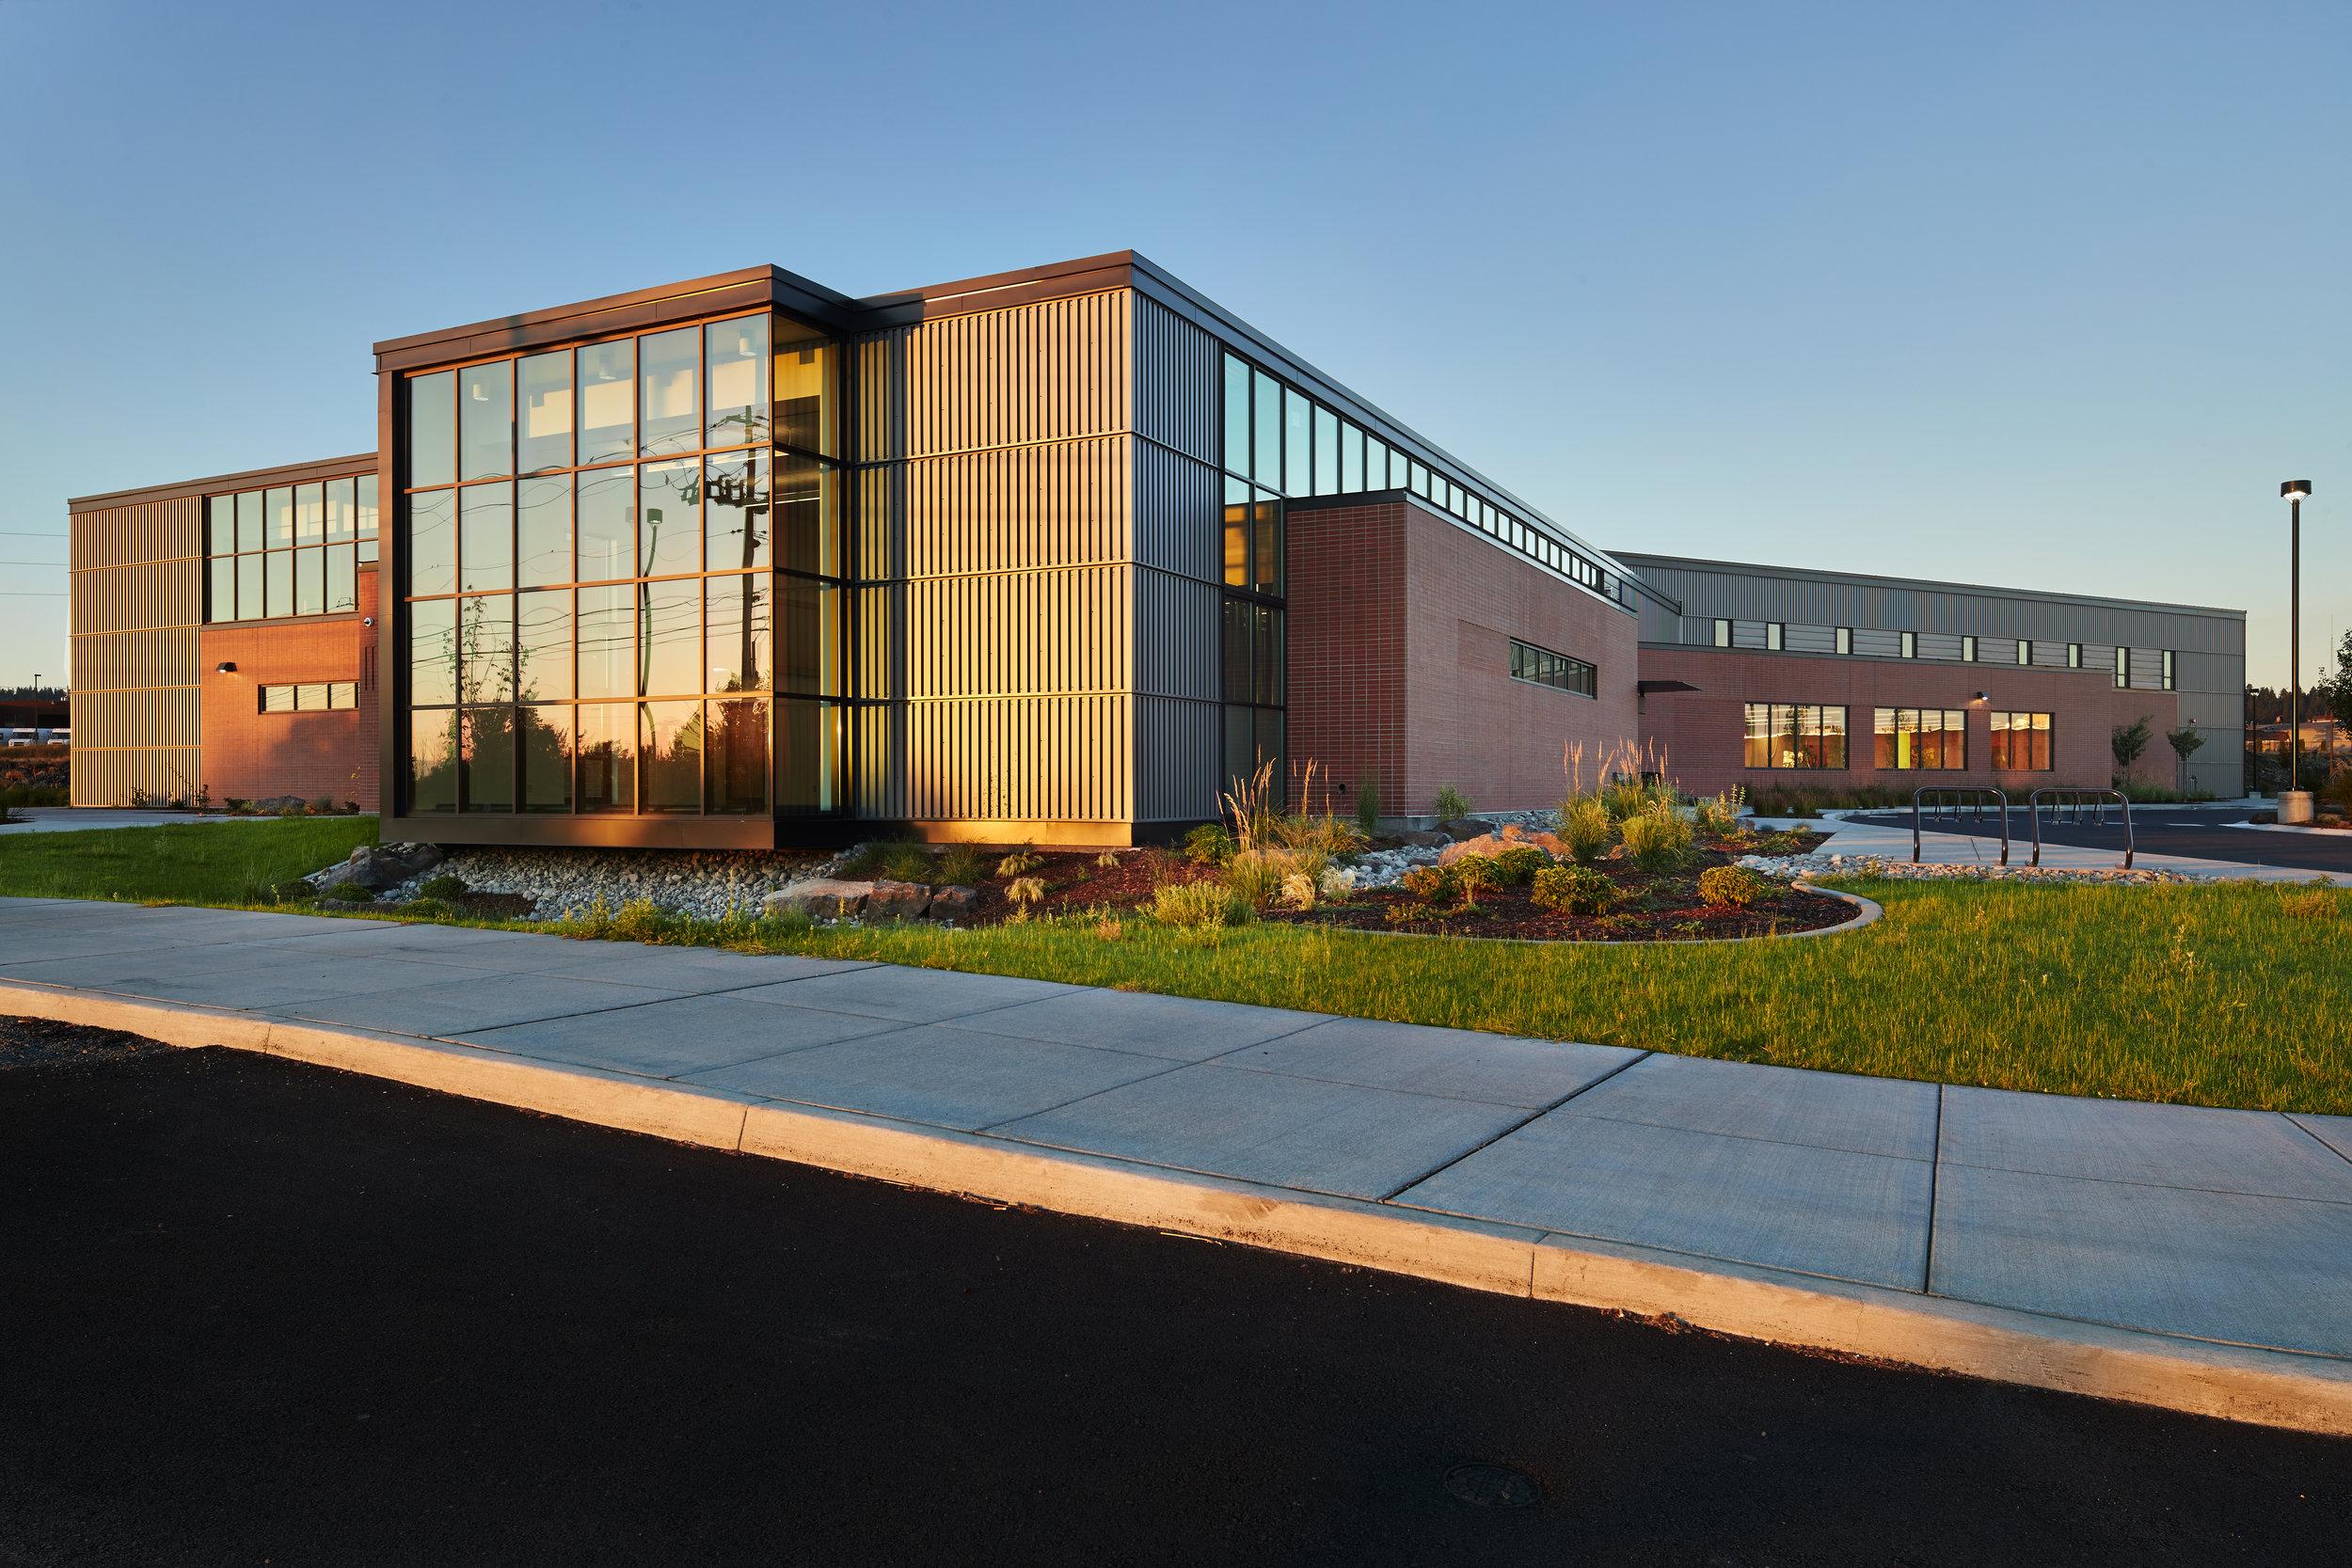 The Spokane Teaching Health Clinic